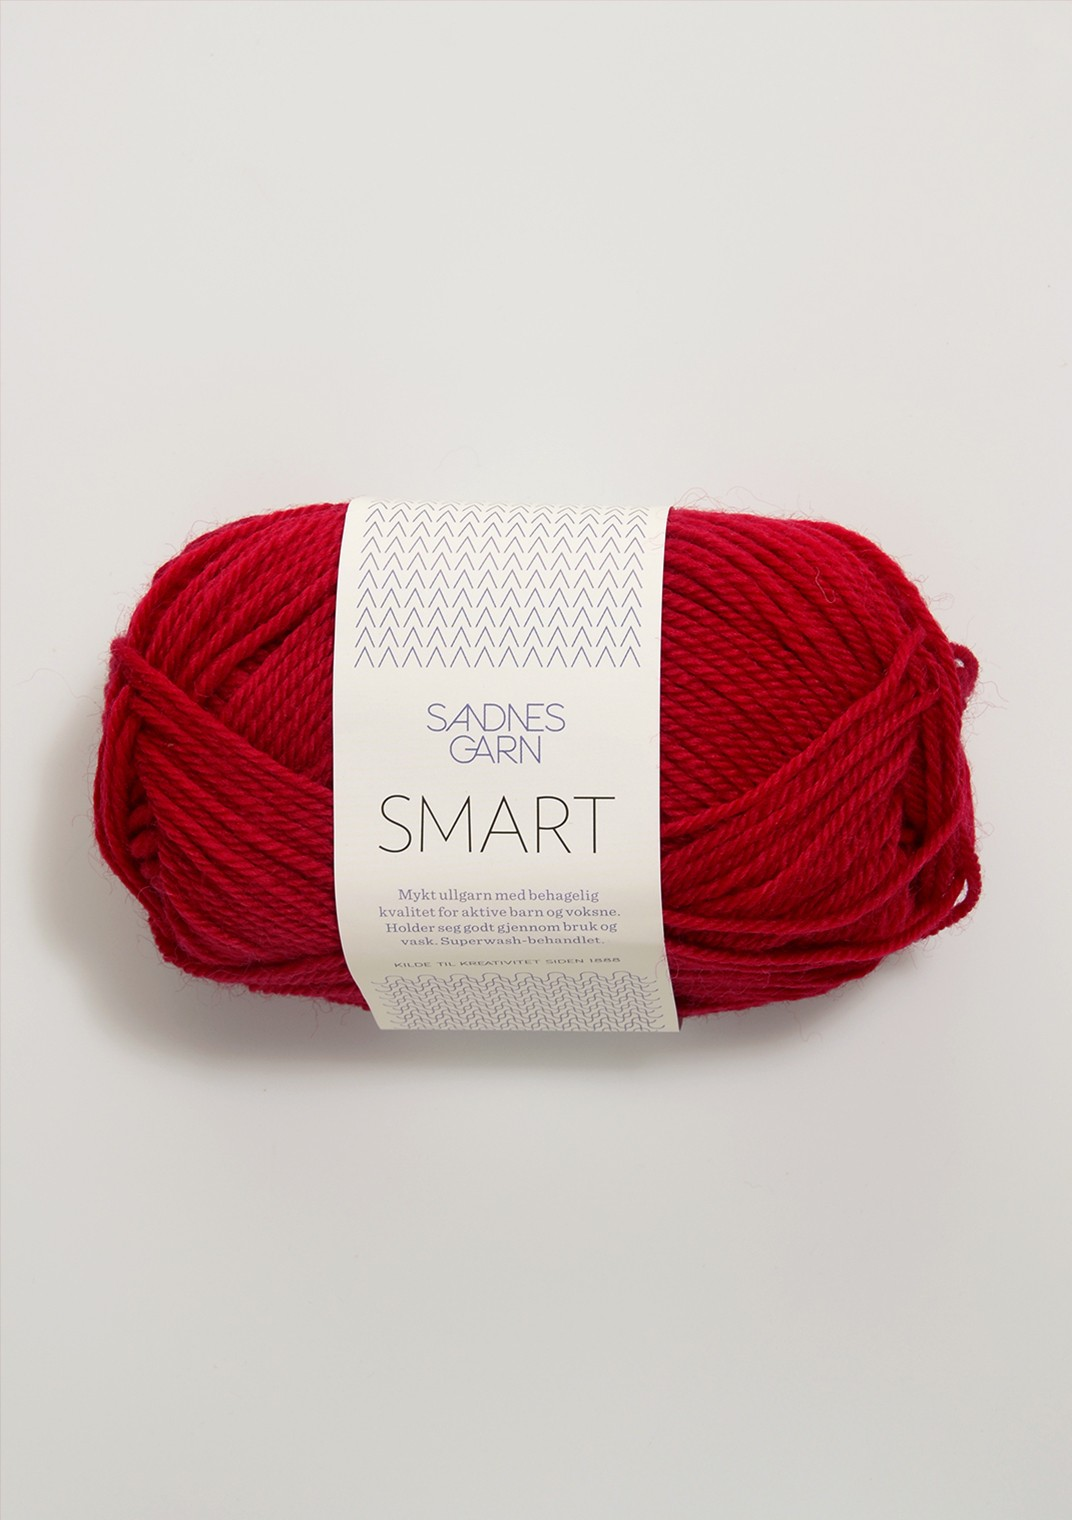 Sandnes smart 4219